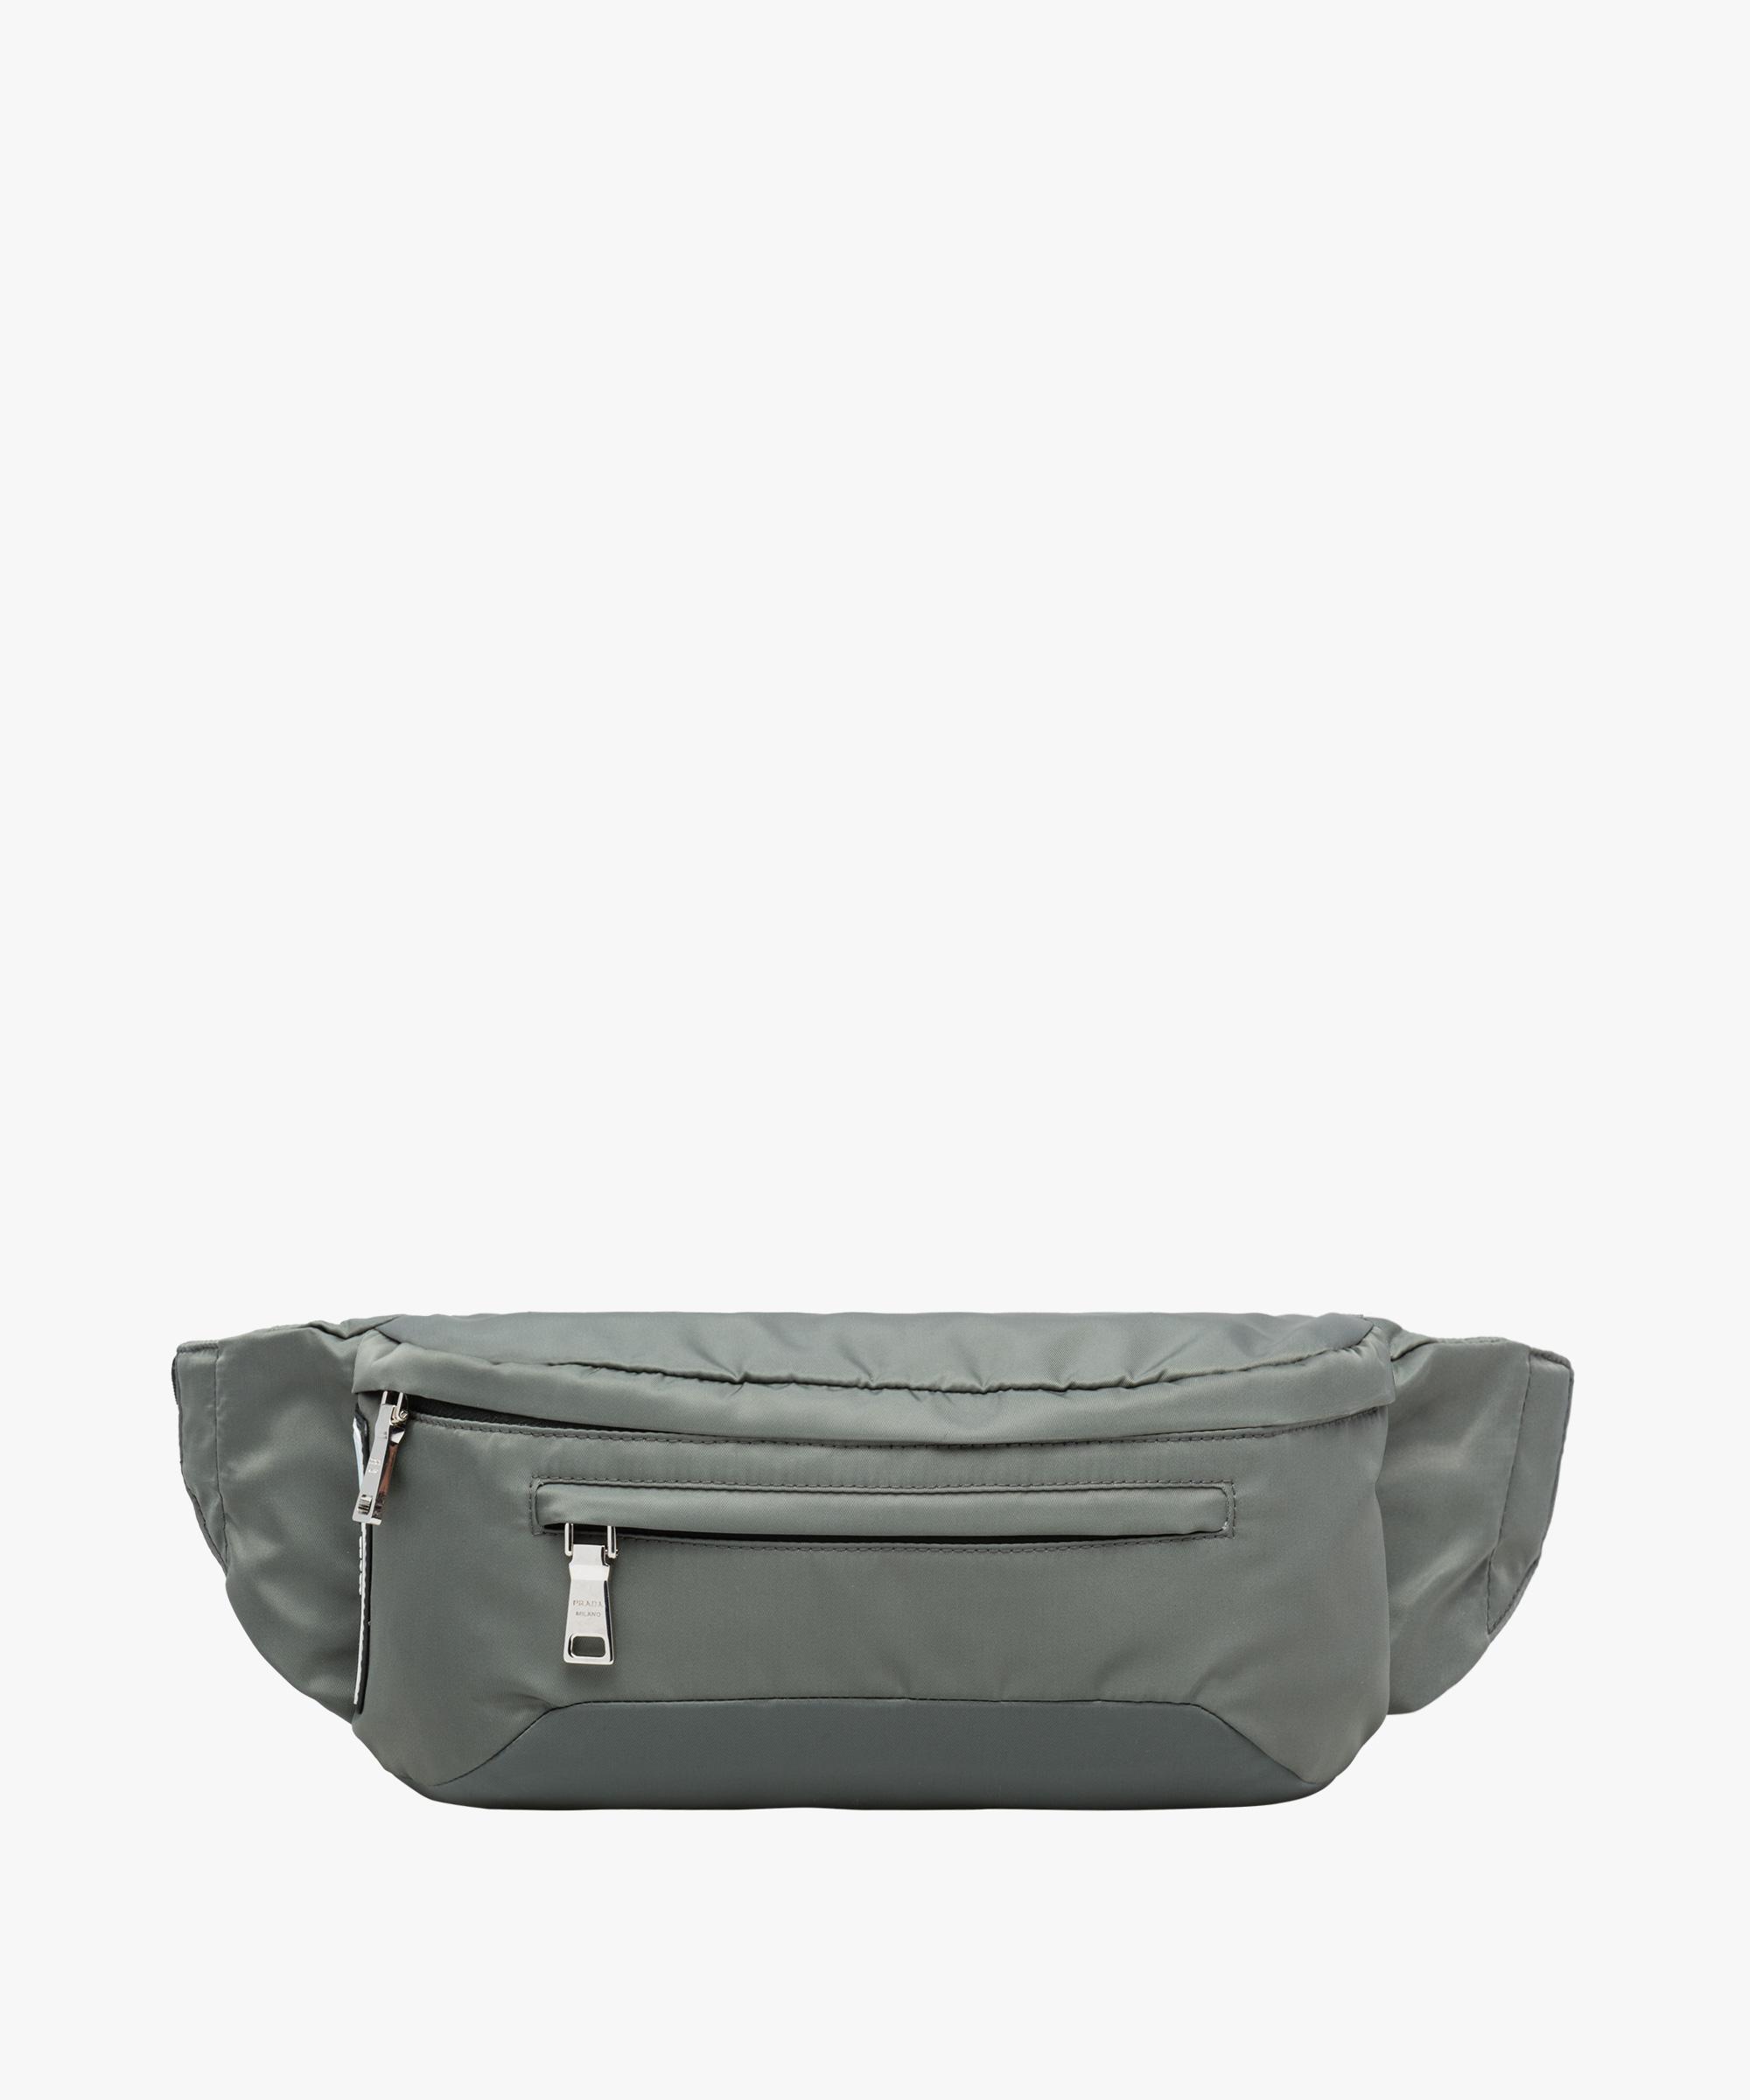 f2b2c94a5380 Prada Technical Fabric Belt Bag in Gray for Men - Lyst